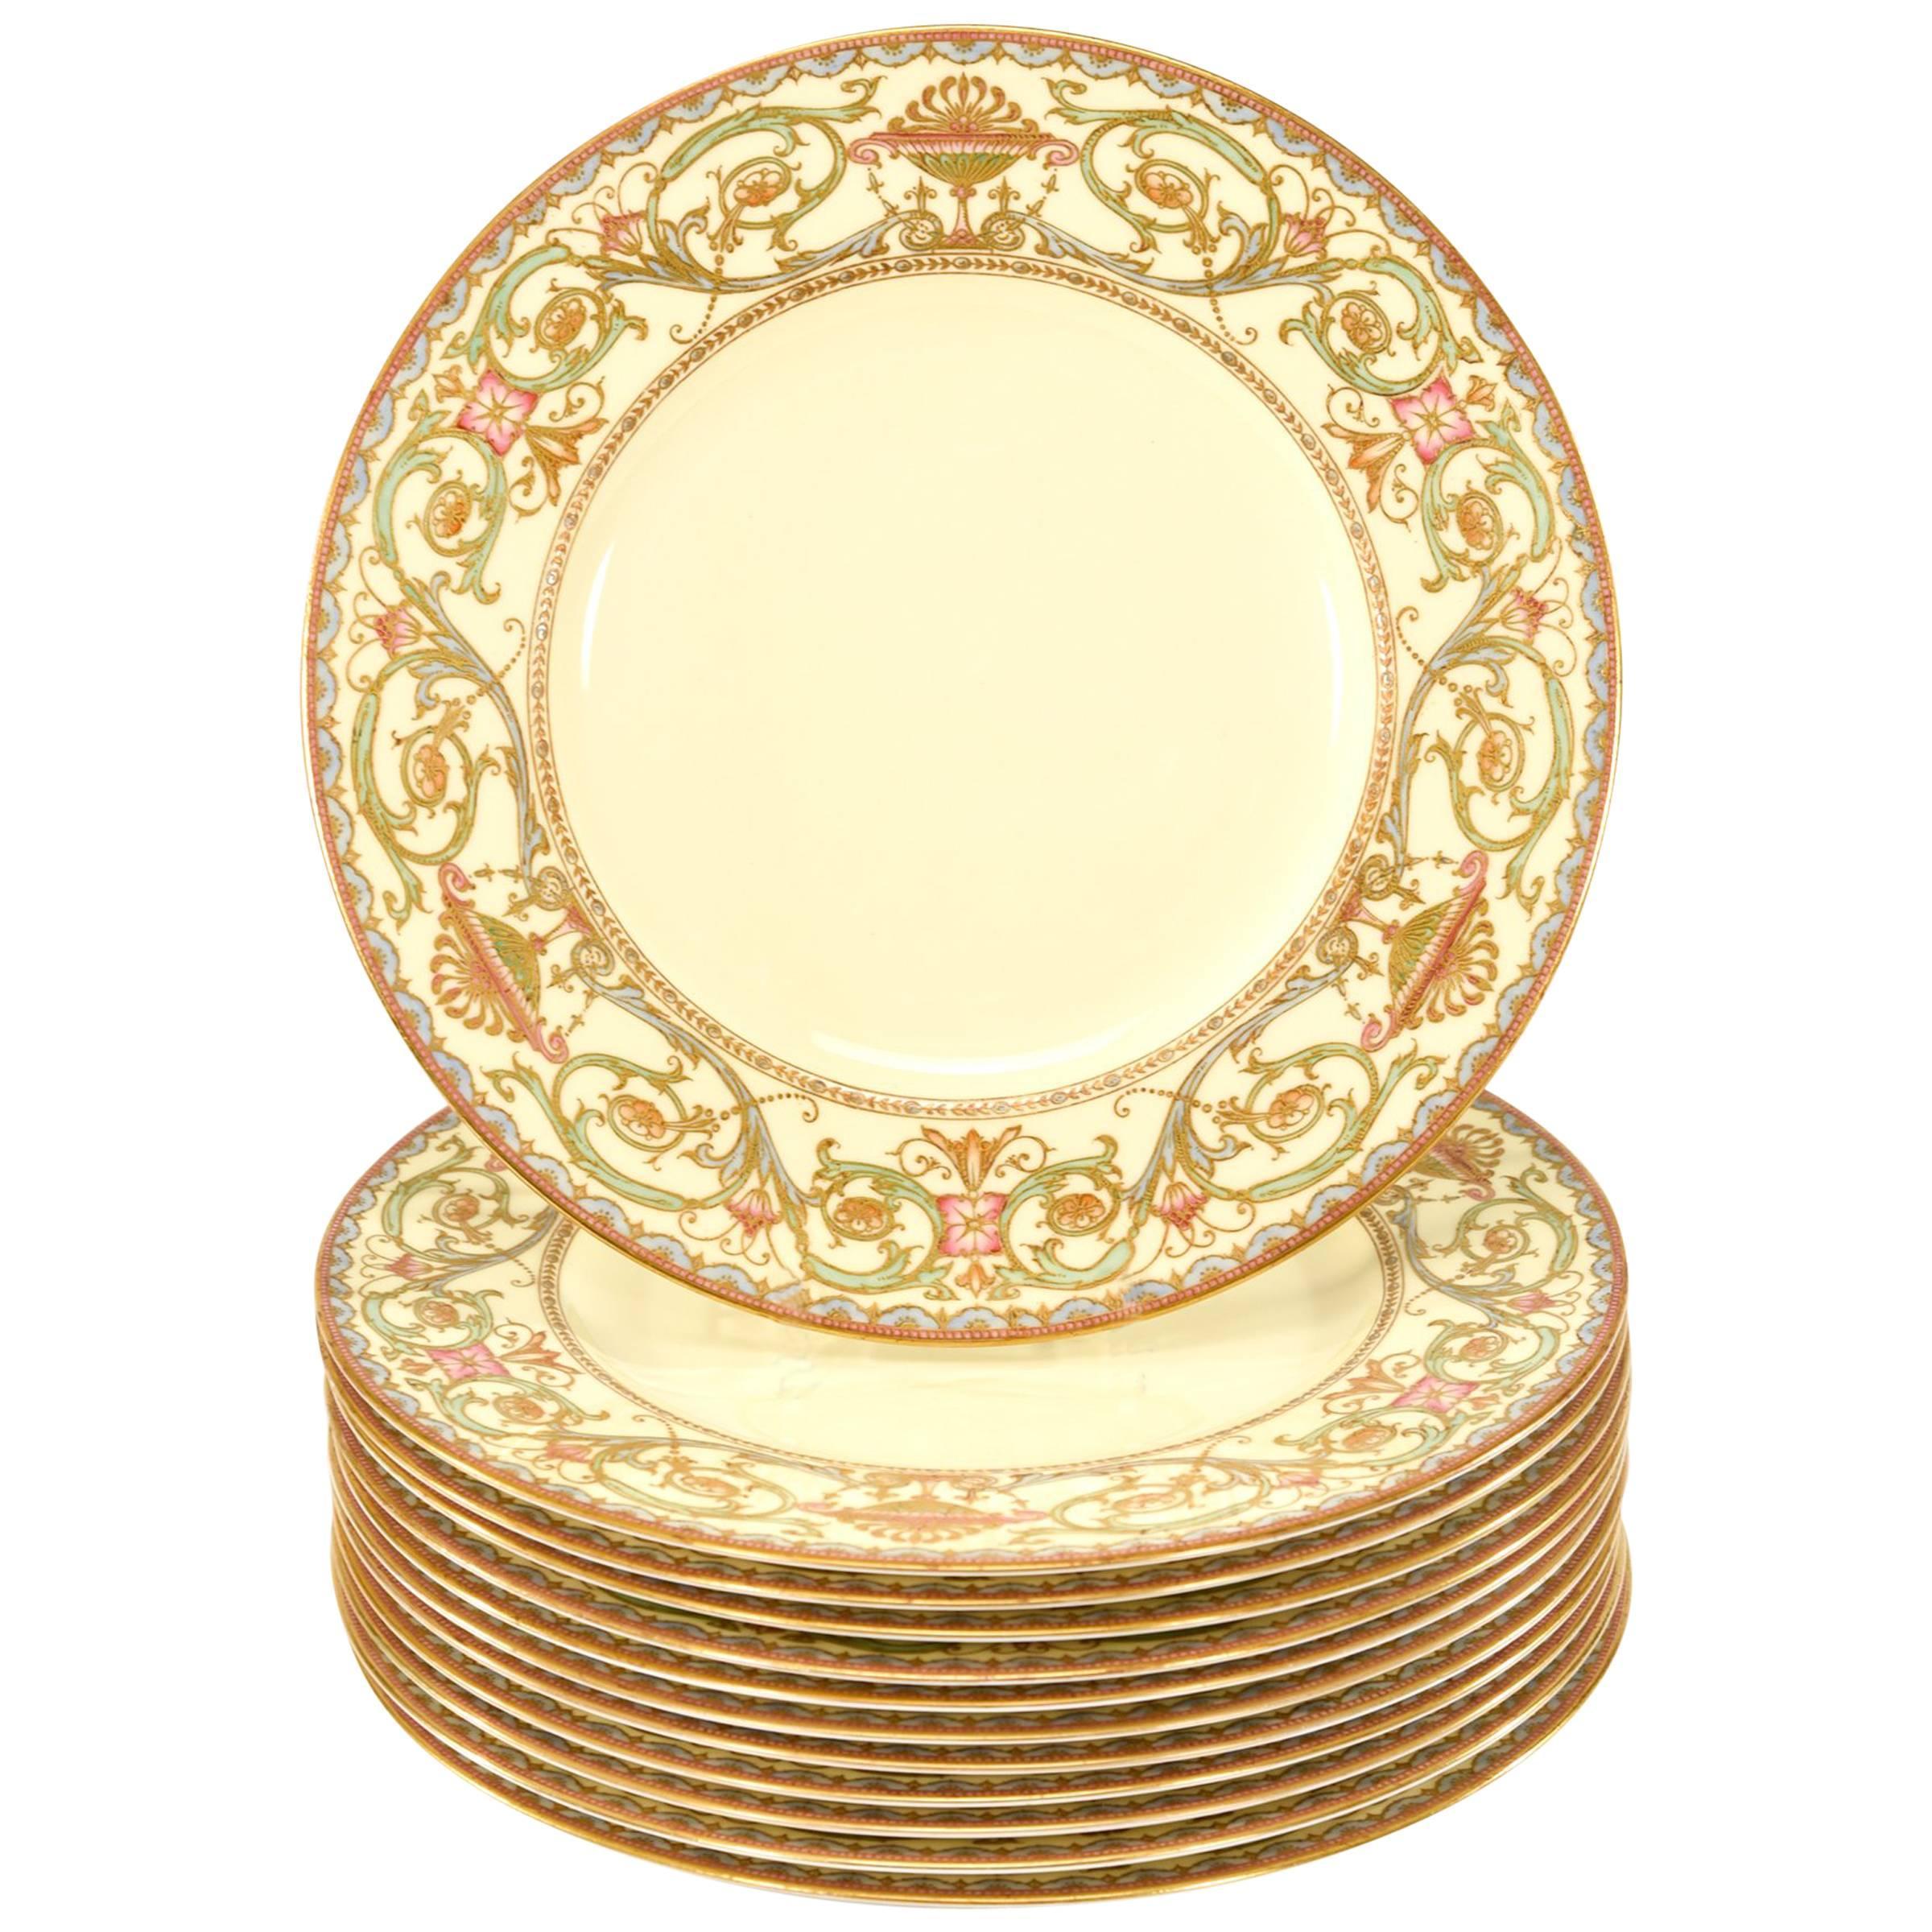 Set of 12 Royal Worcester Cream & Multicolored Enamel & Gold Dinner Plates